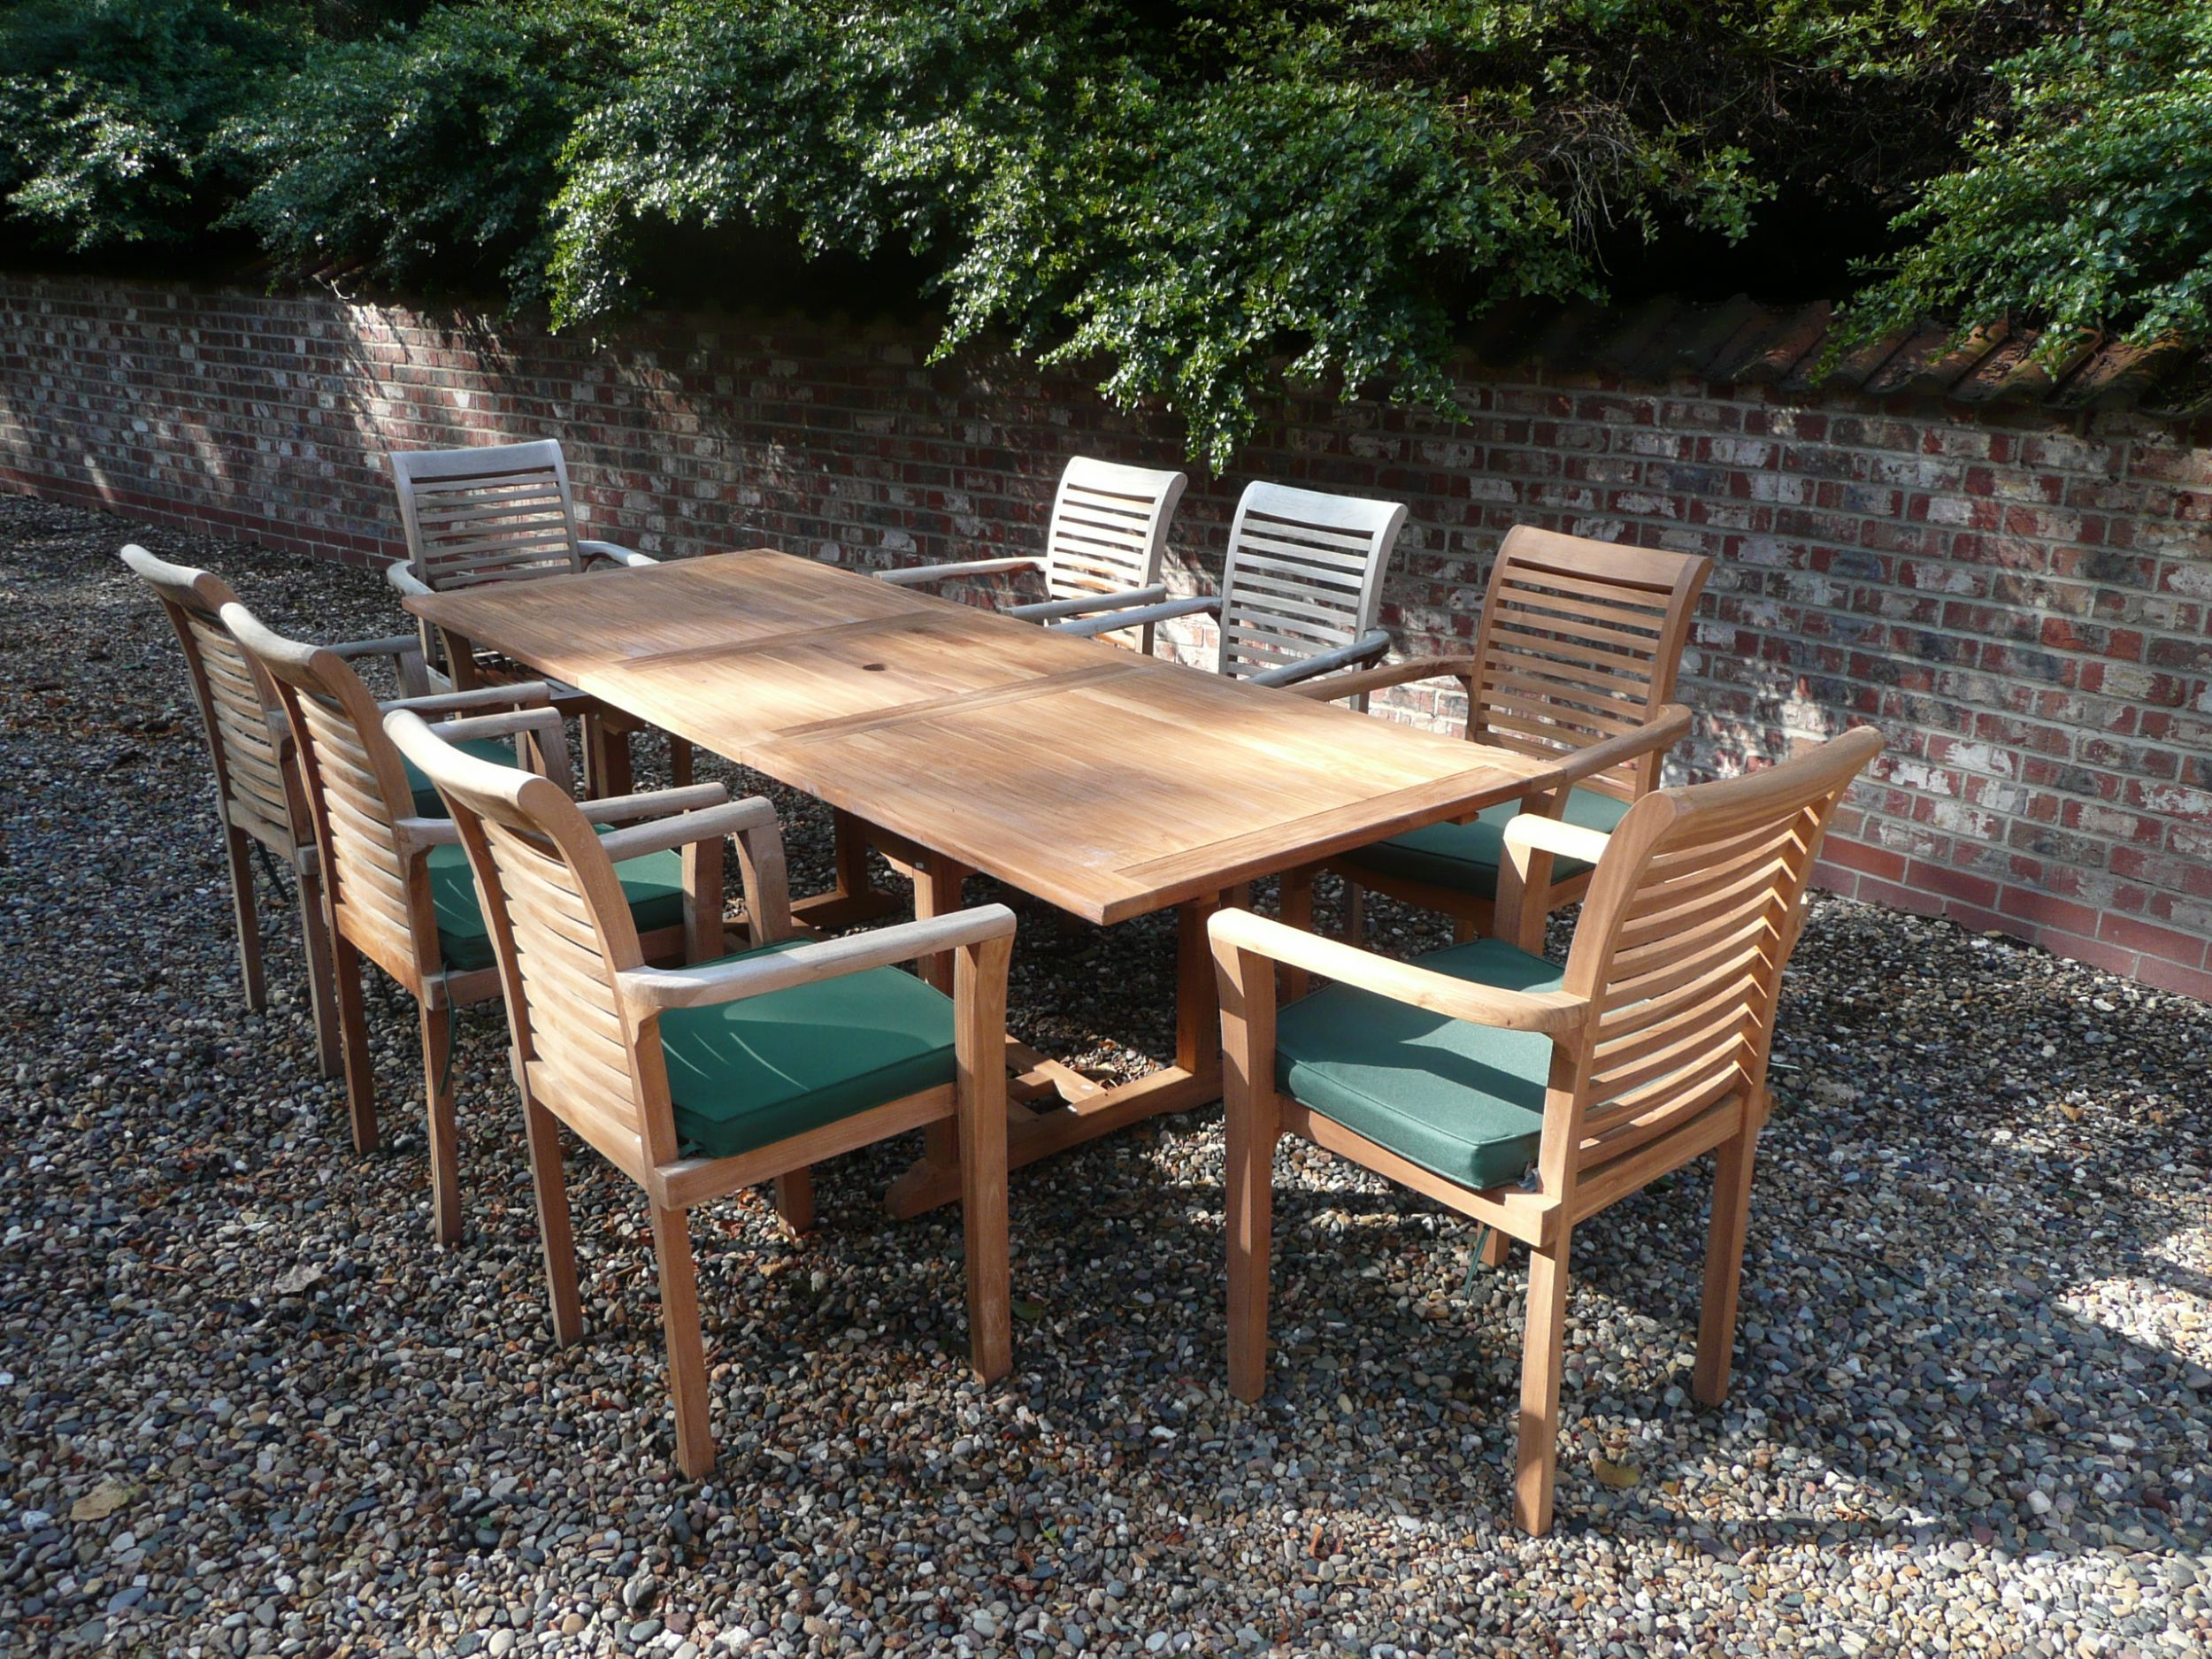 Harrogate Teak Garden Furniture Set Hunters Of Yorkshire Teak Garden Furniture Build Outdoor Furniture Teak Wood